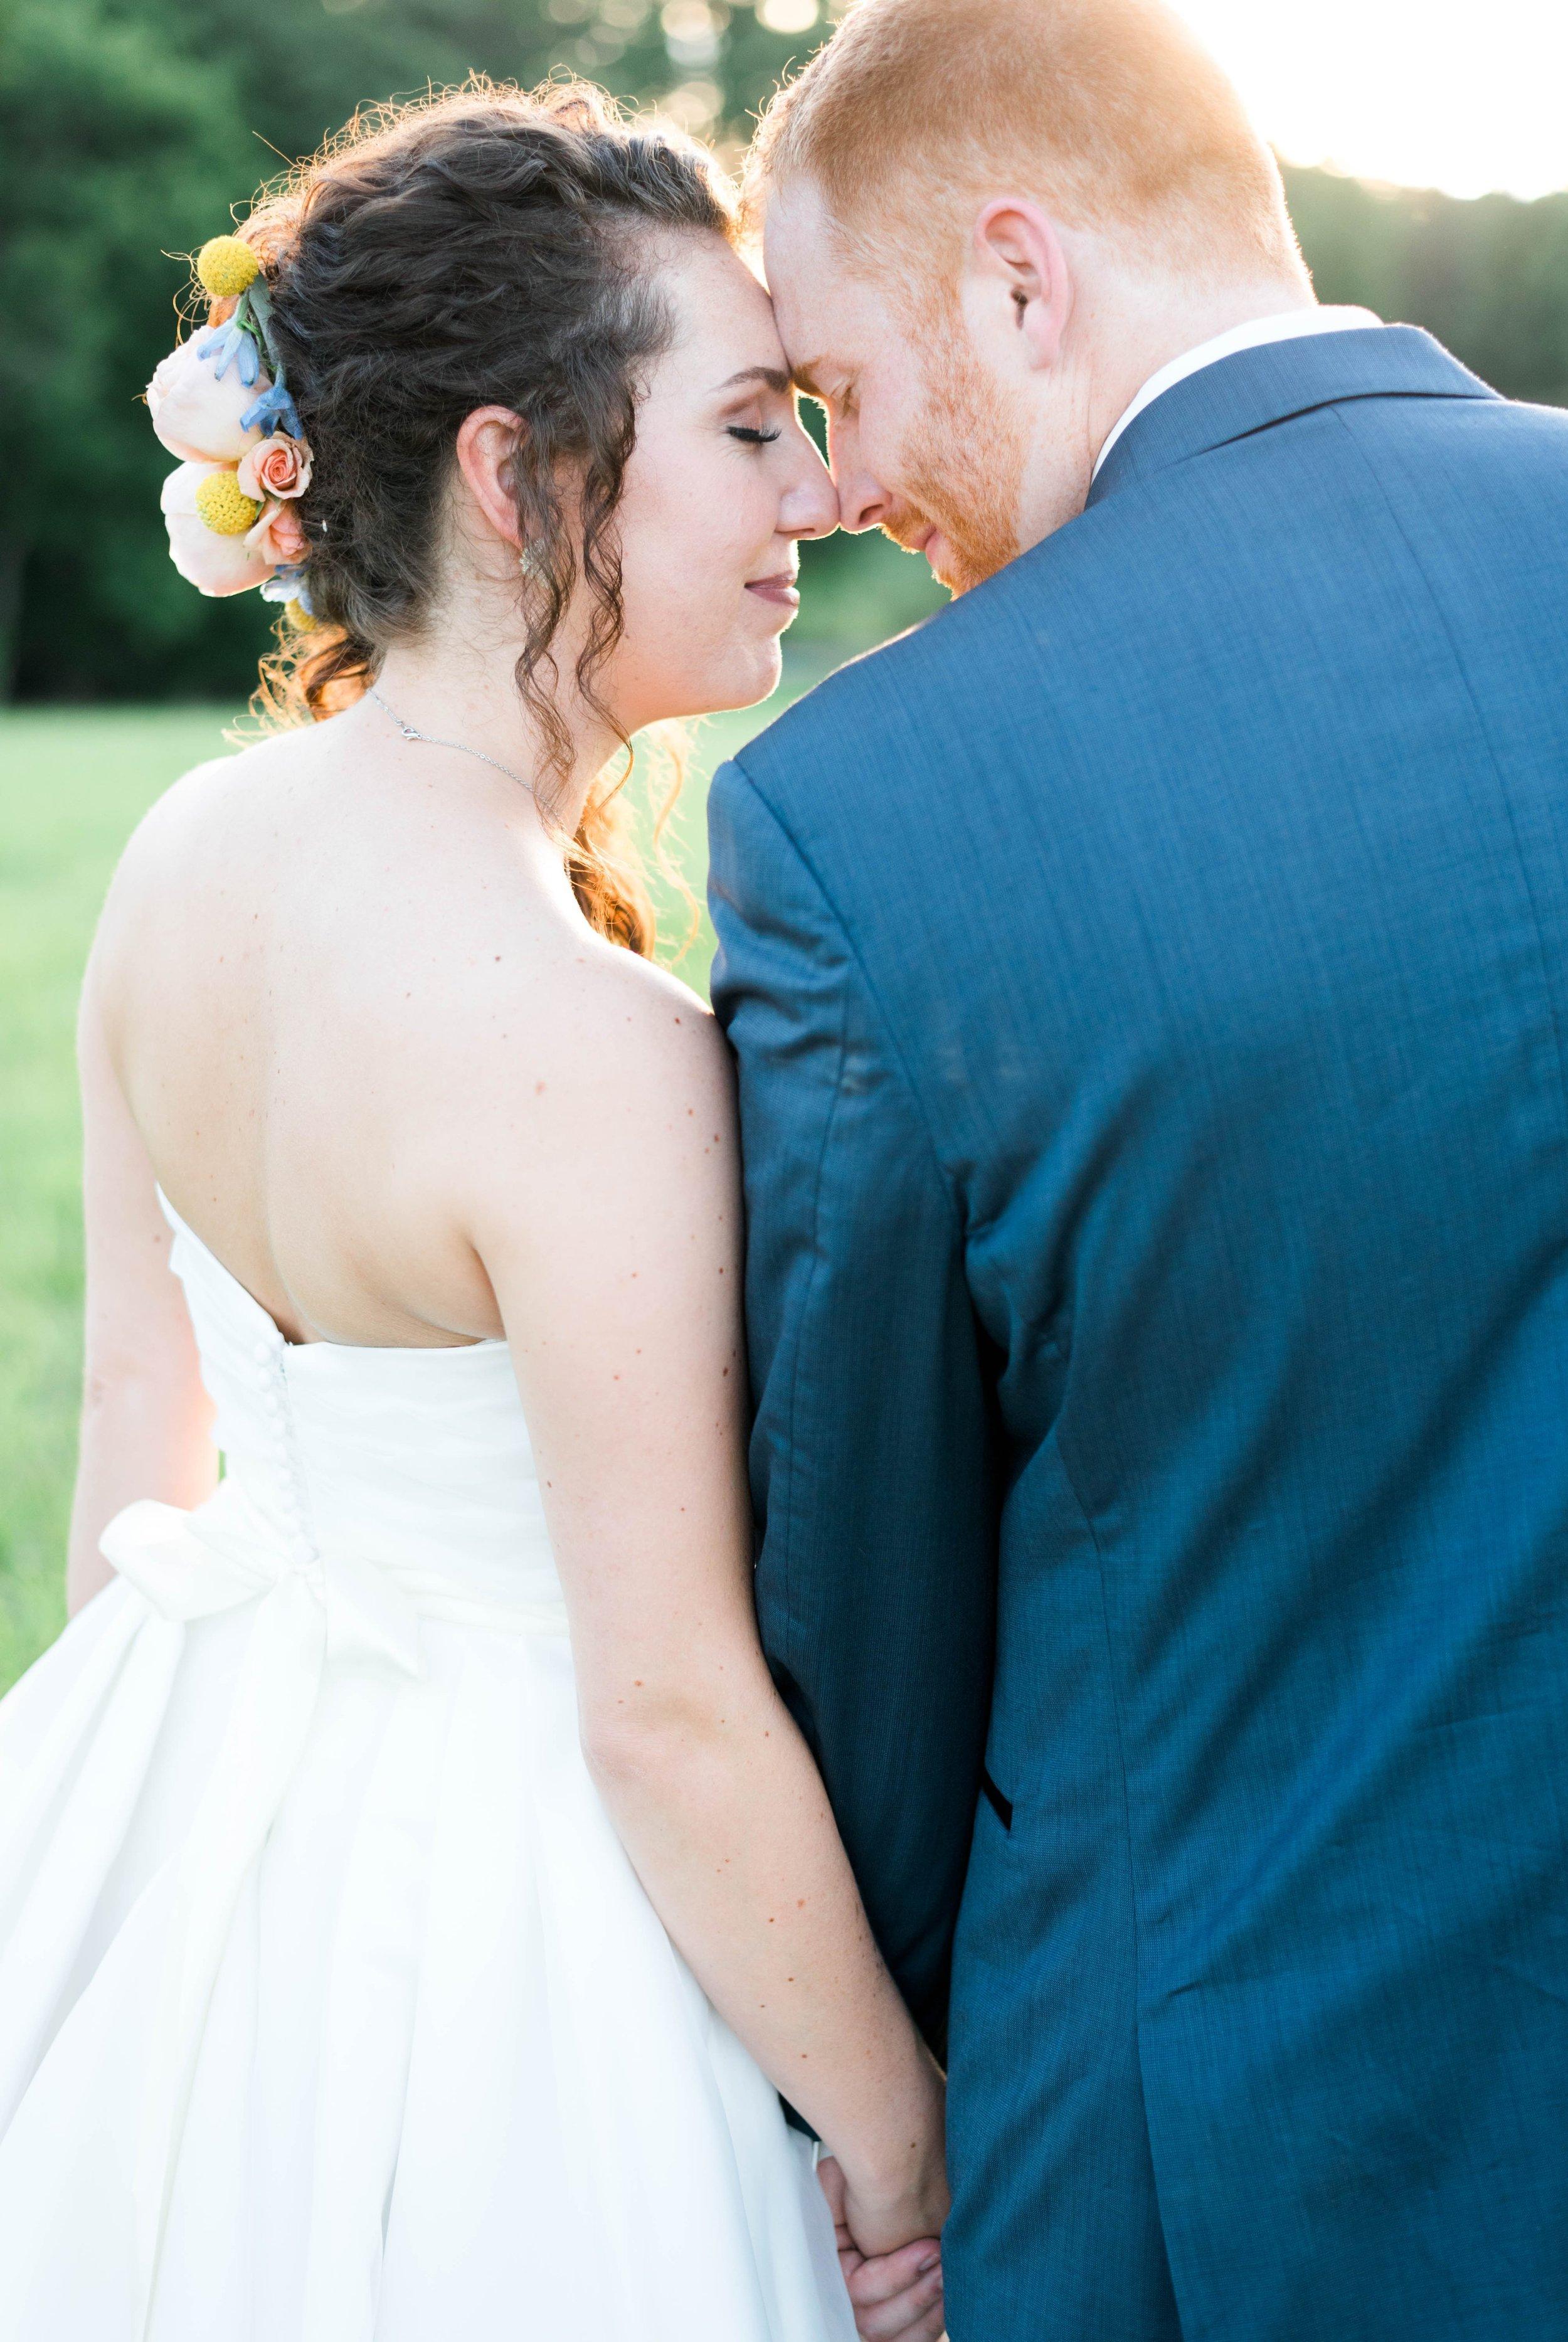 SorellaFarms_EvingtonVA_Lynchburgweddingphotographer_VirginiaweddingPhotographer_AshleyAndrewSorellaFarmsWedding 20.jpg